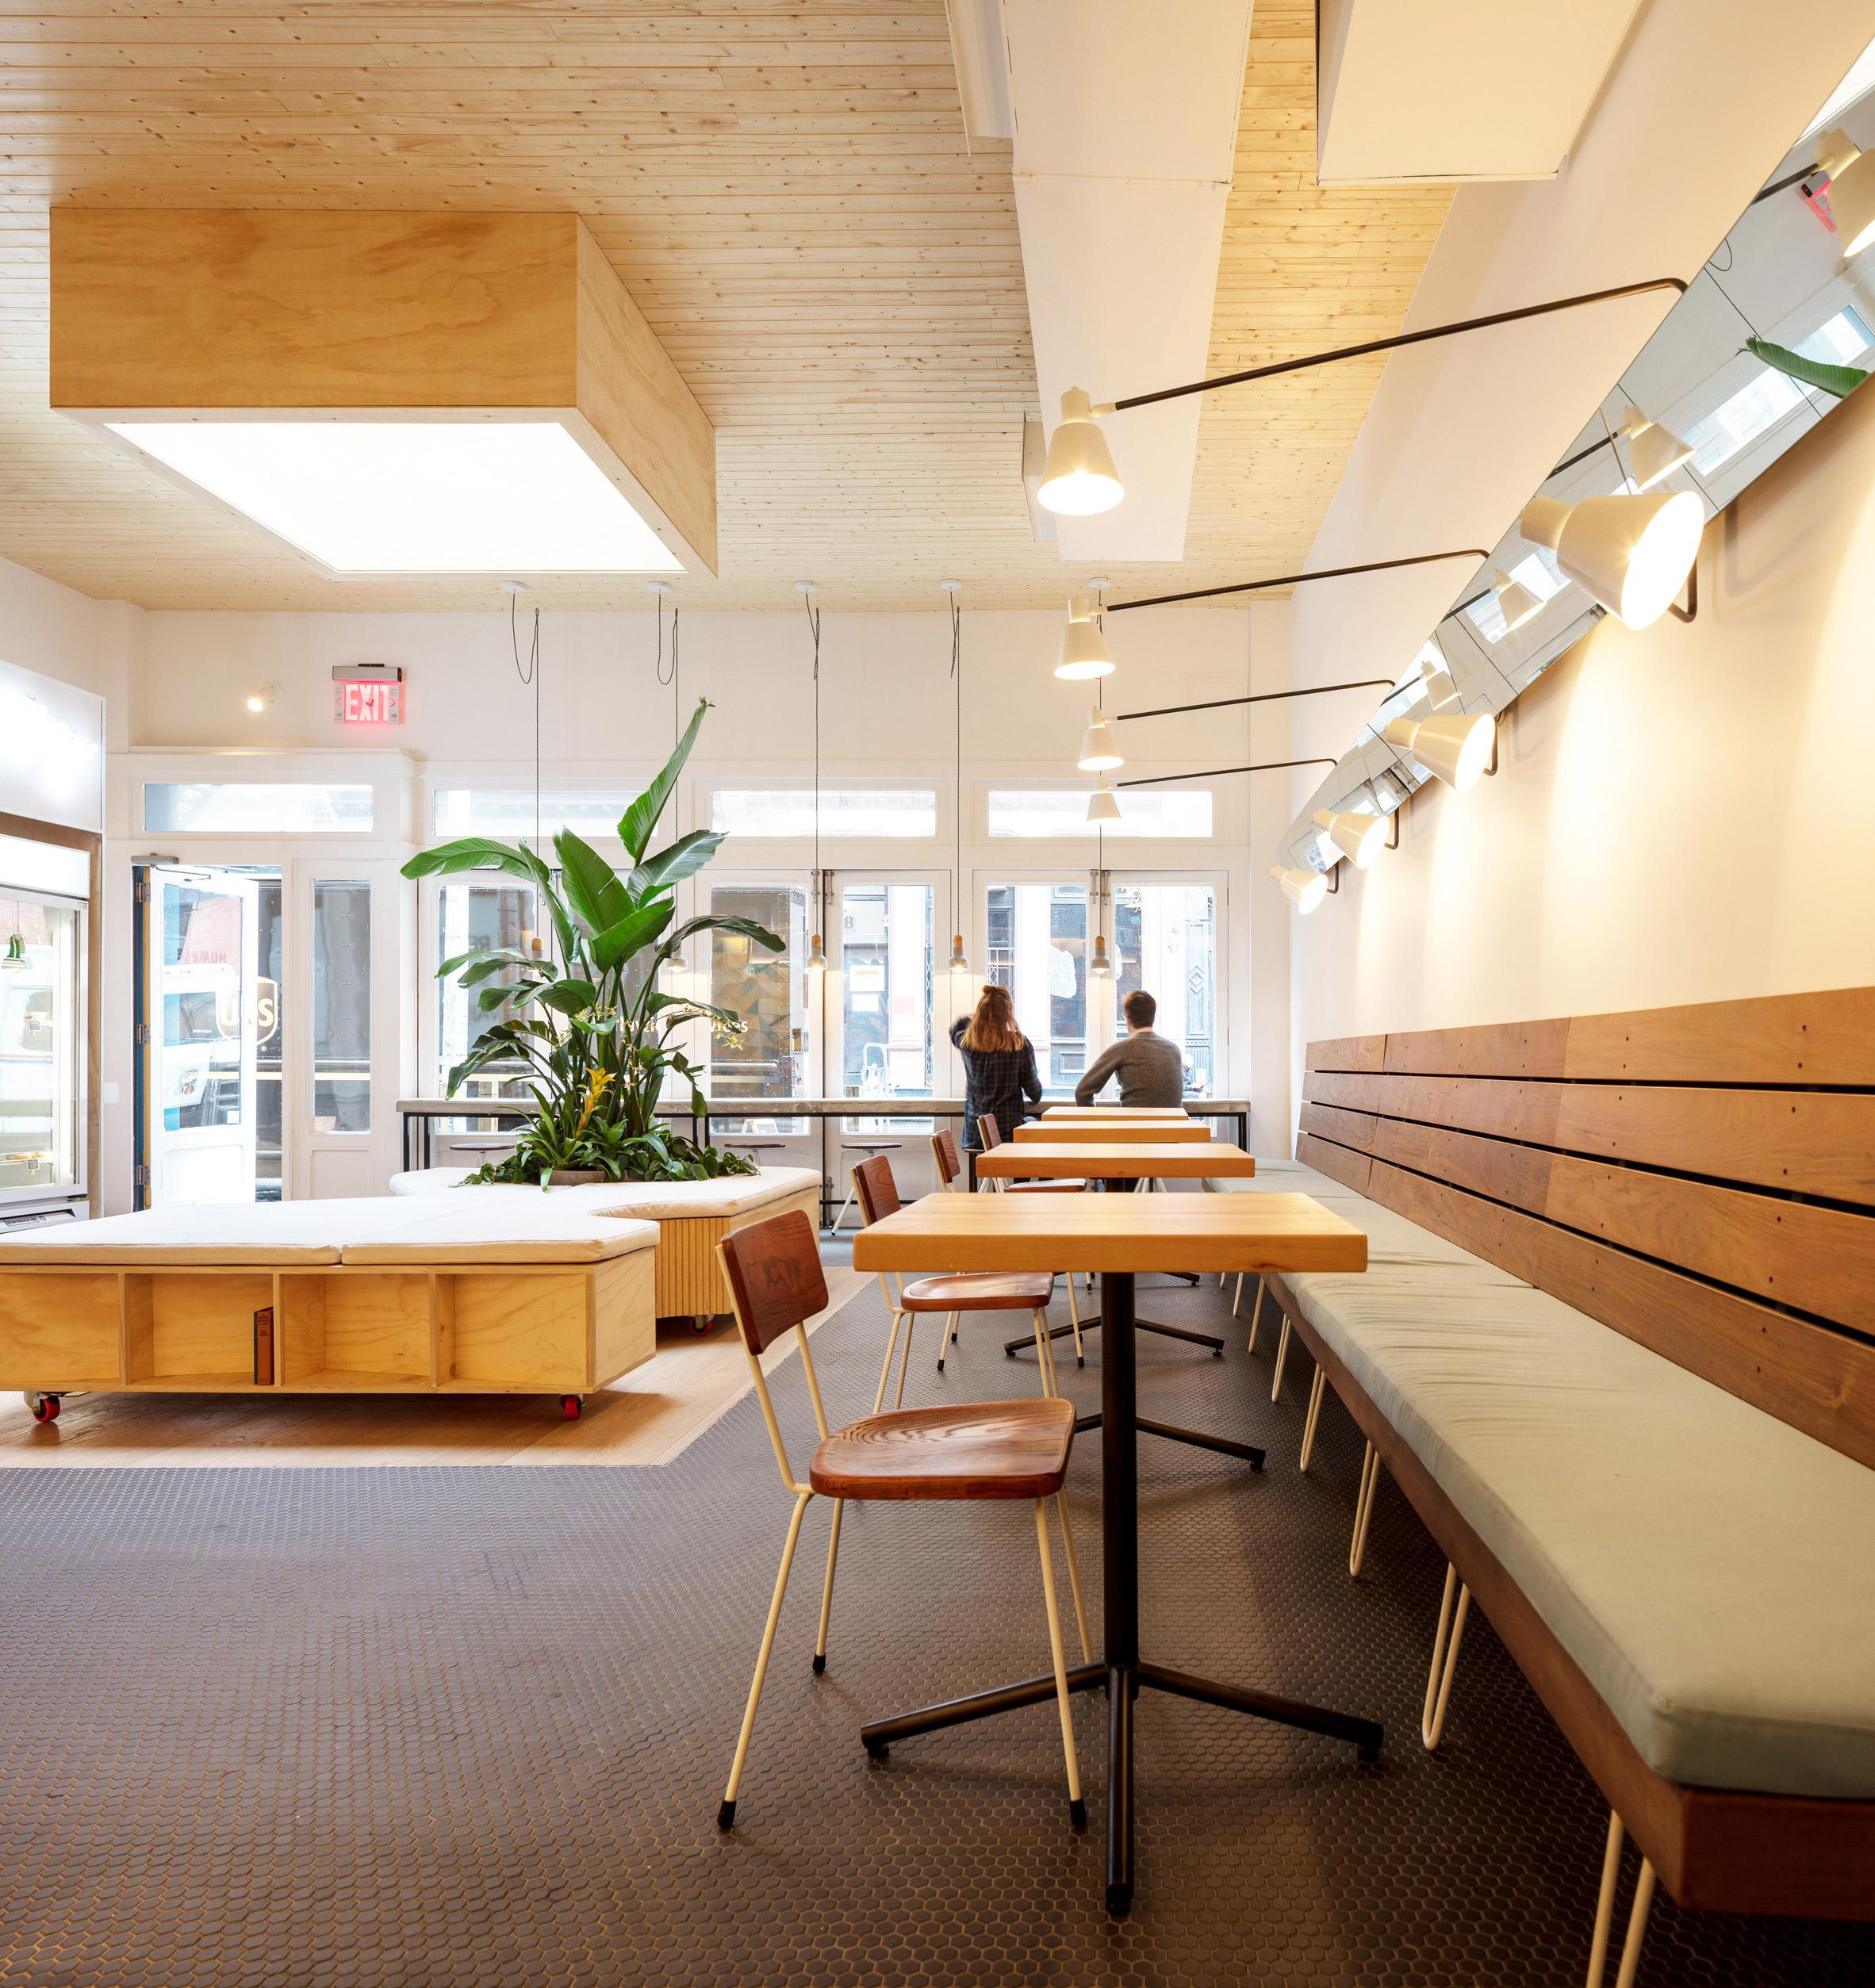 humblefish-poke-restaurant-architecture-outfit-tribeca-new-york_dezainaa_2.jpg